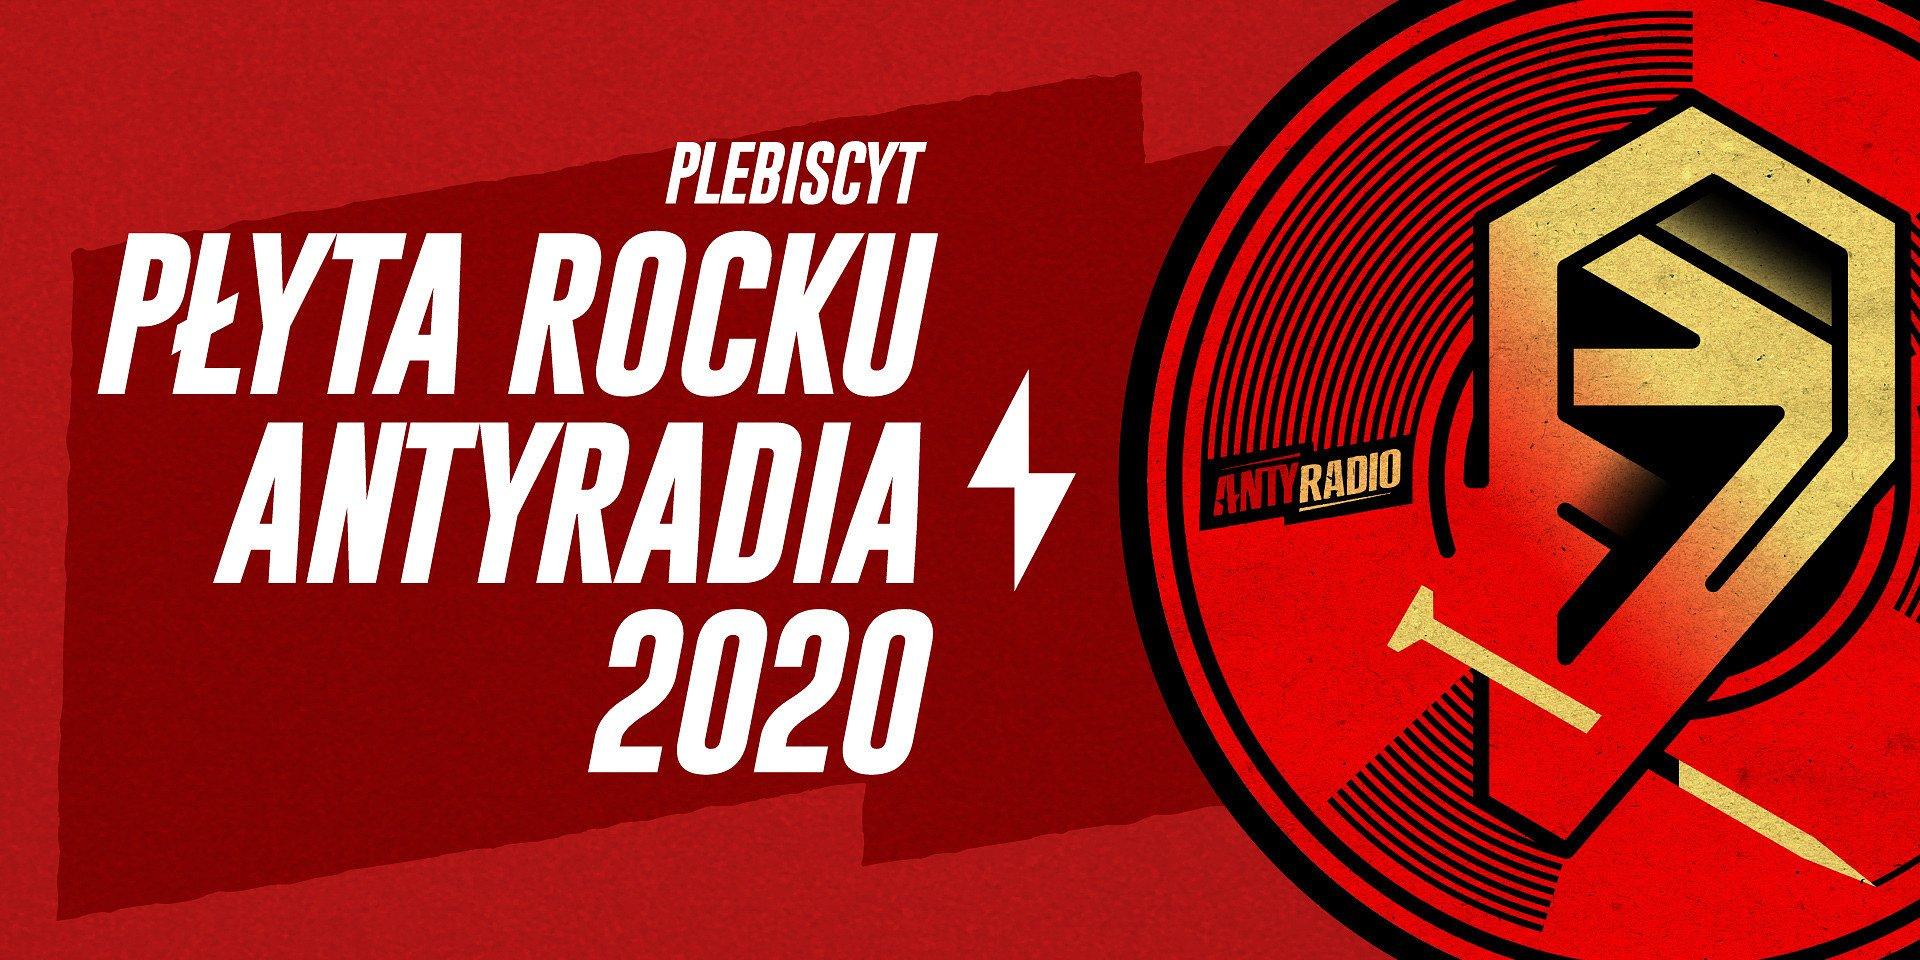 Płyta Rocku Antyradia 2020